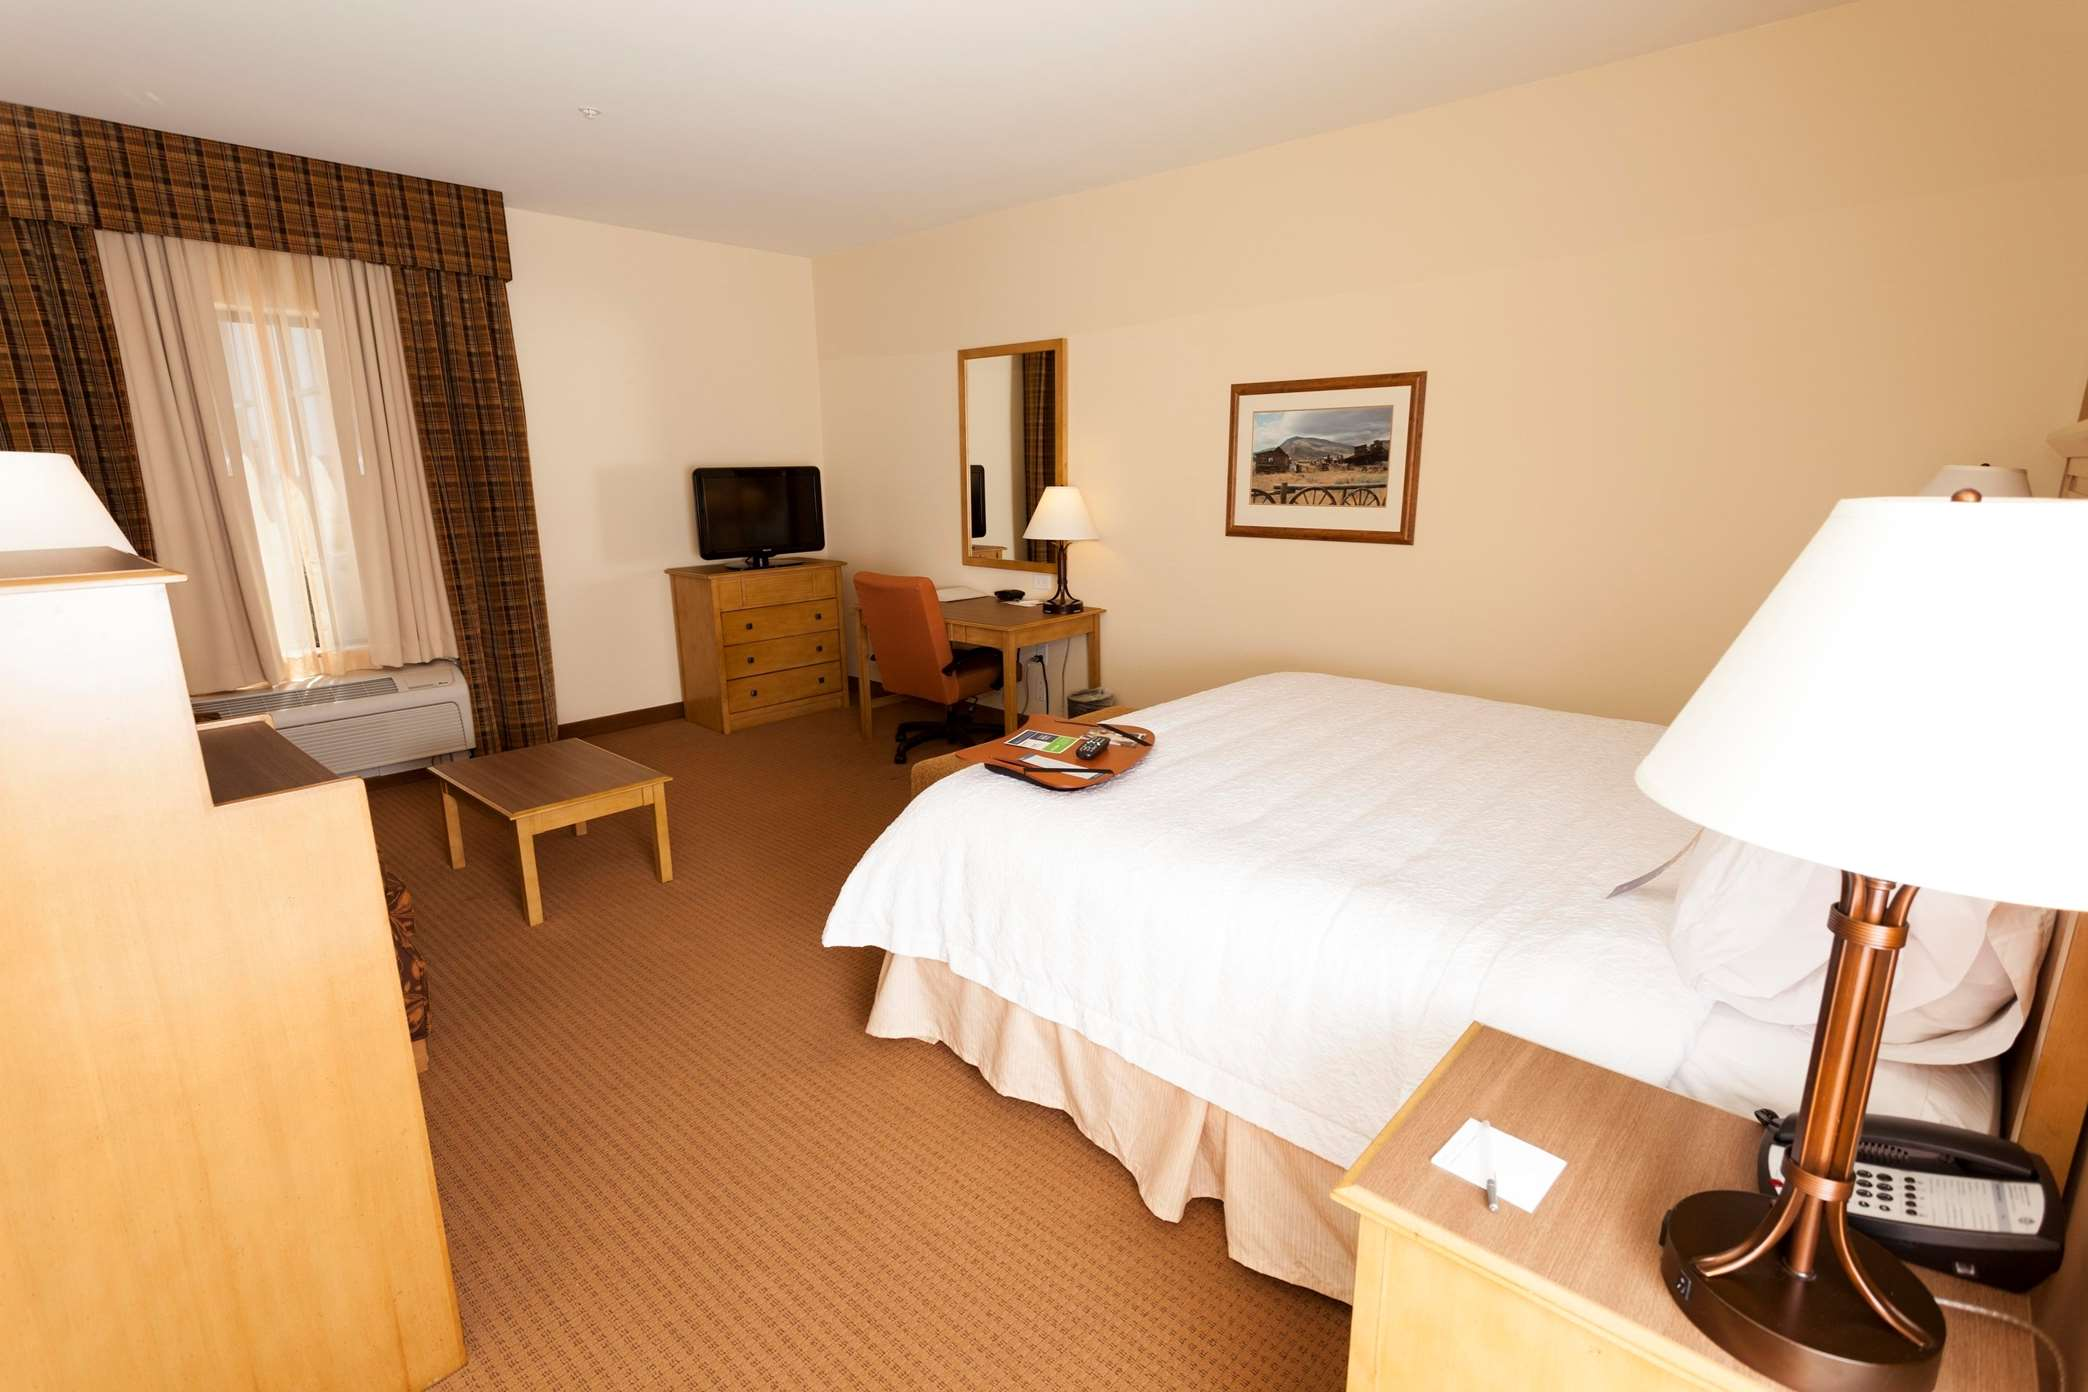 Hampton Inn & Suites Riverton image 2